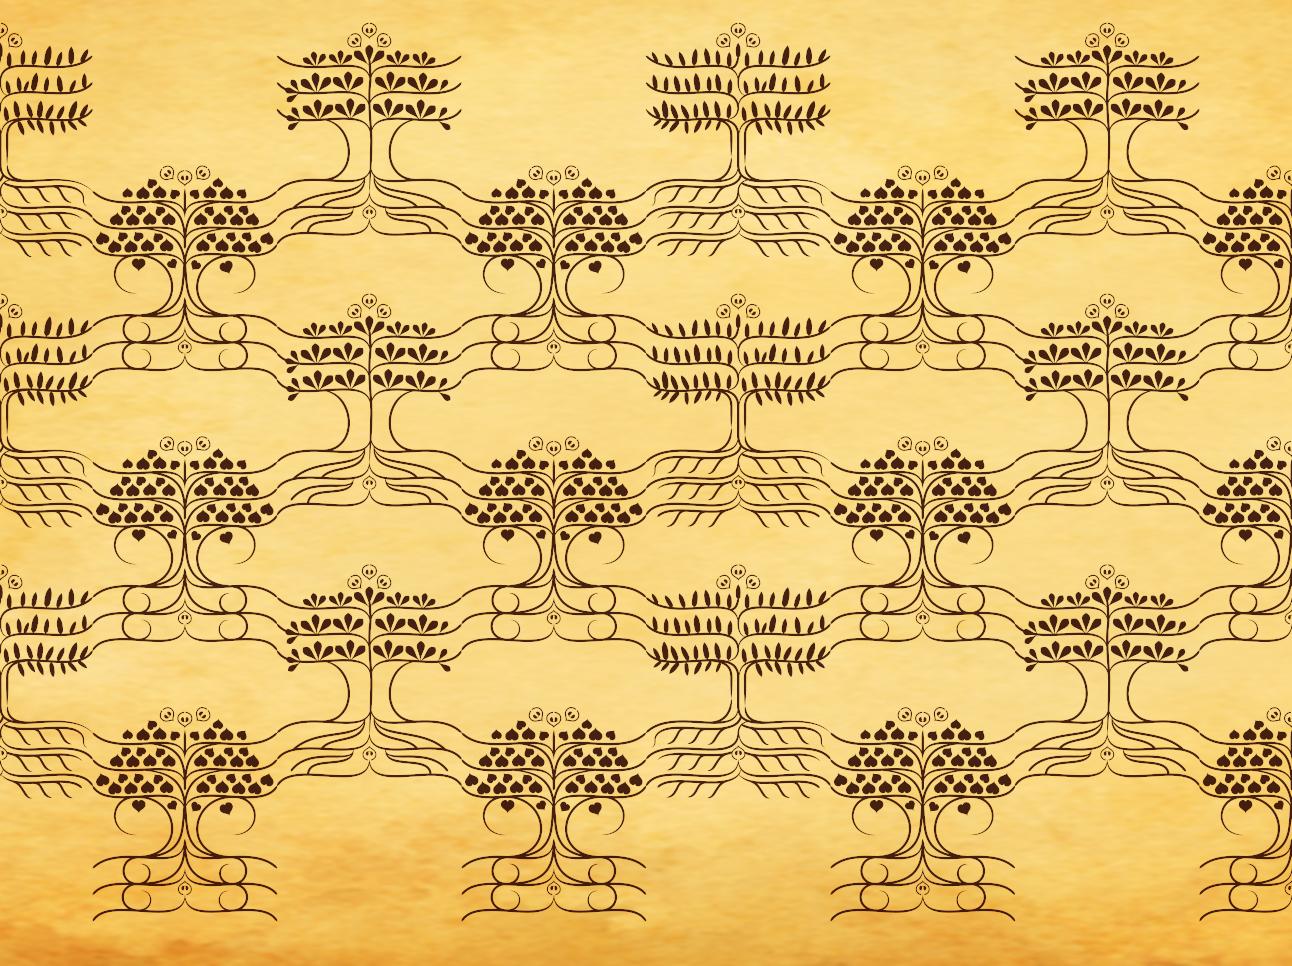 Ishana Tree Grid